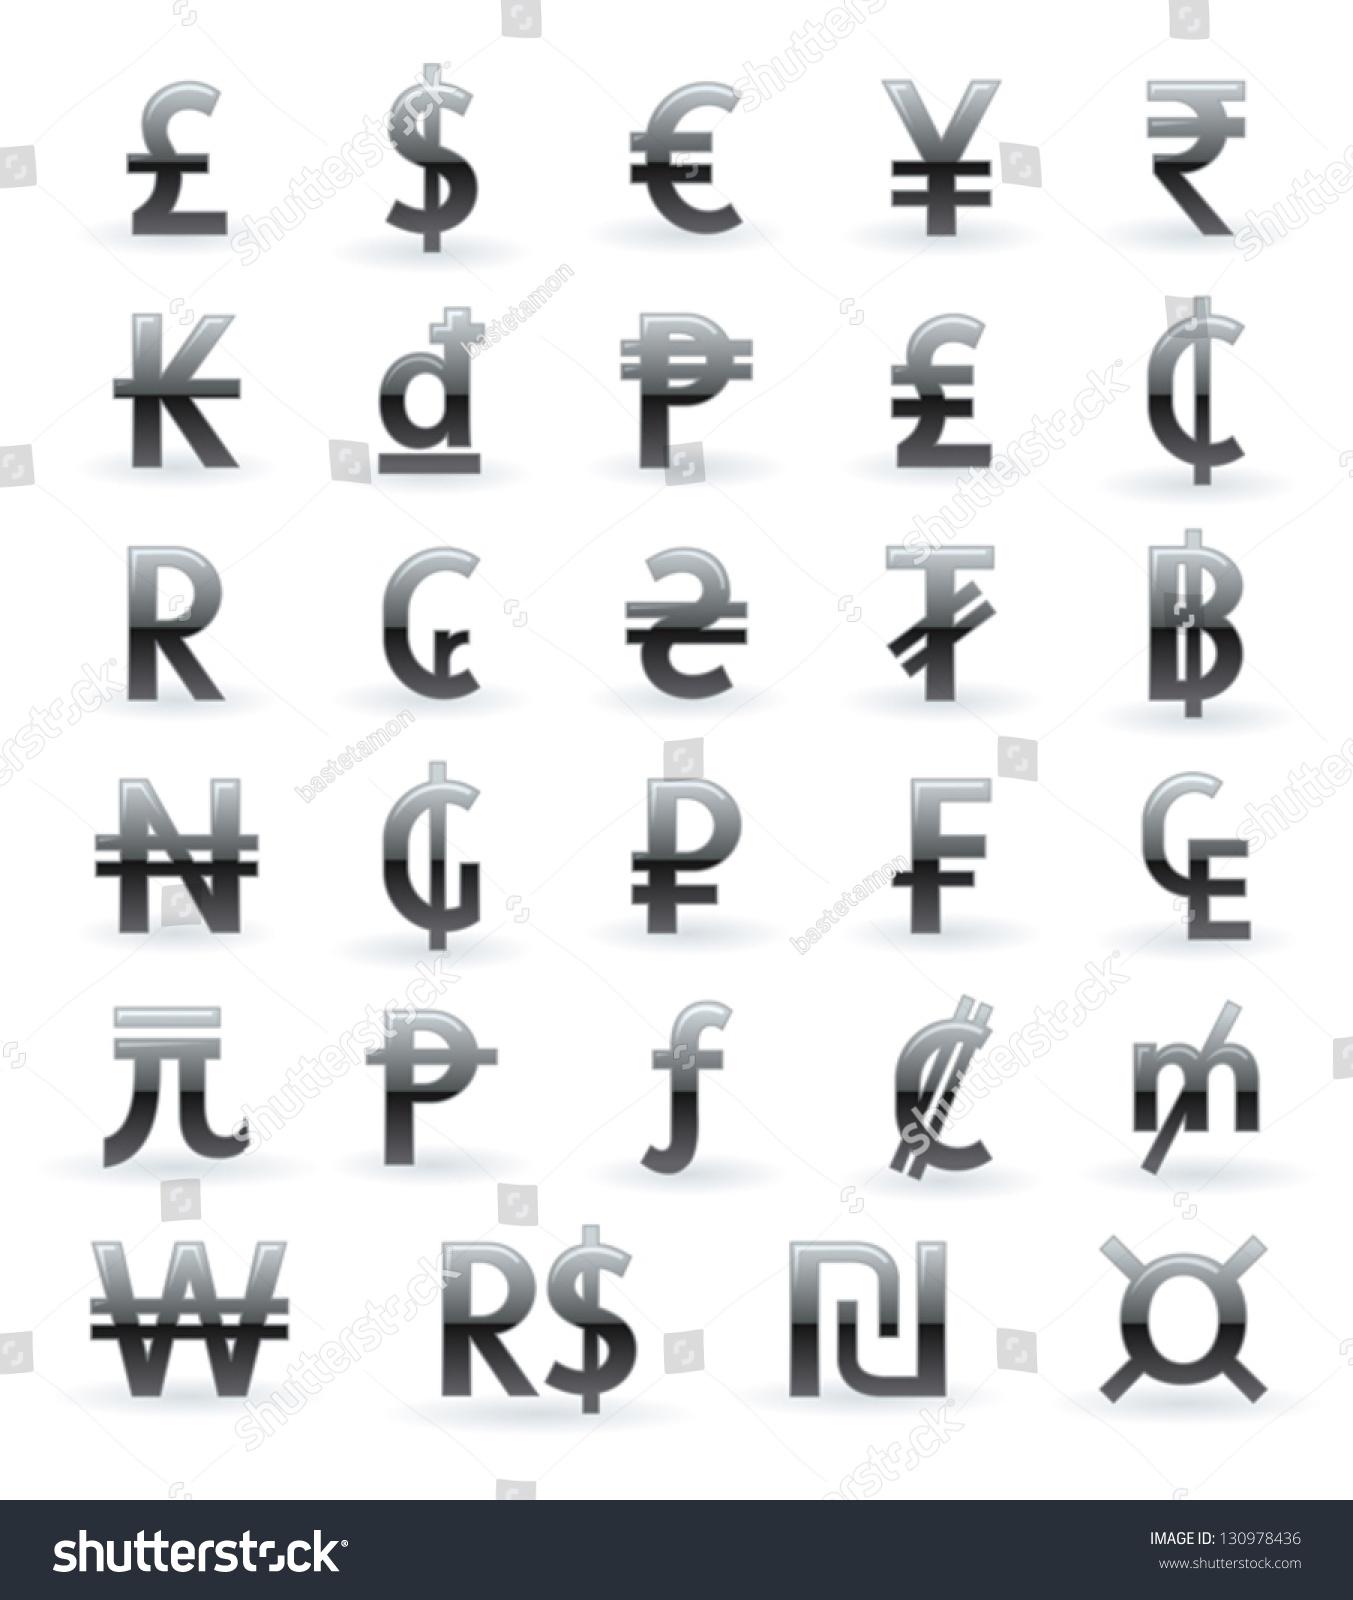 Html Currency Symbols Putin Bitcoin